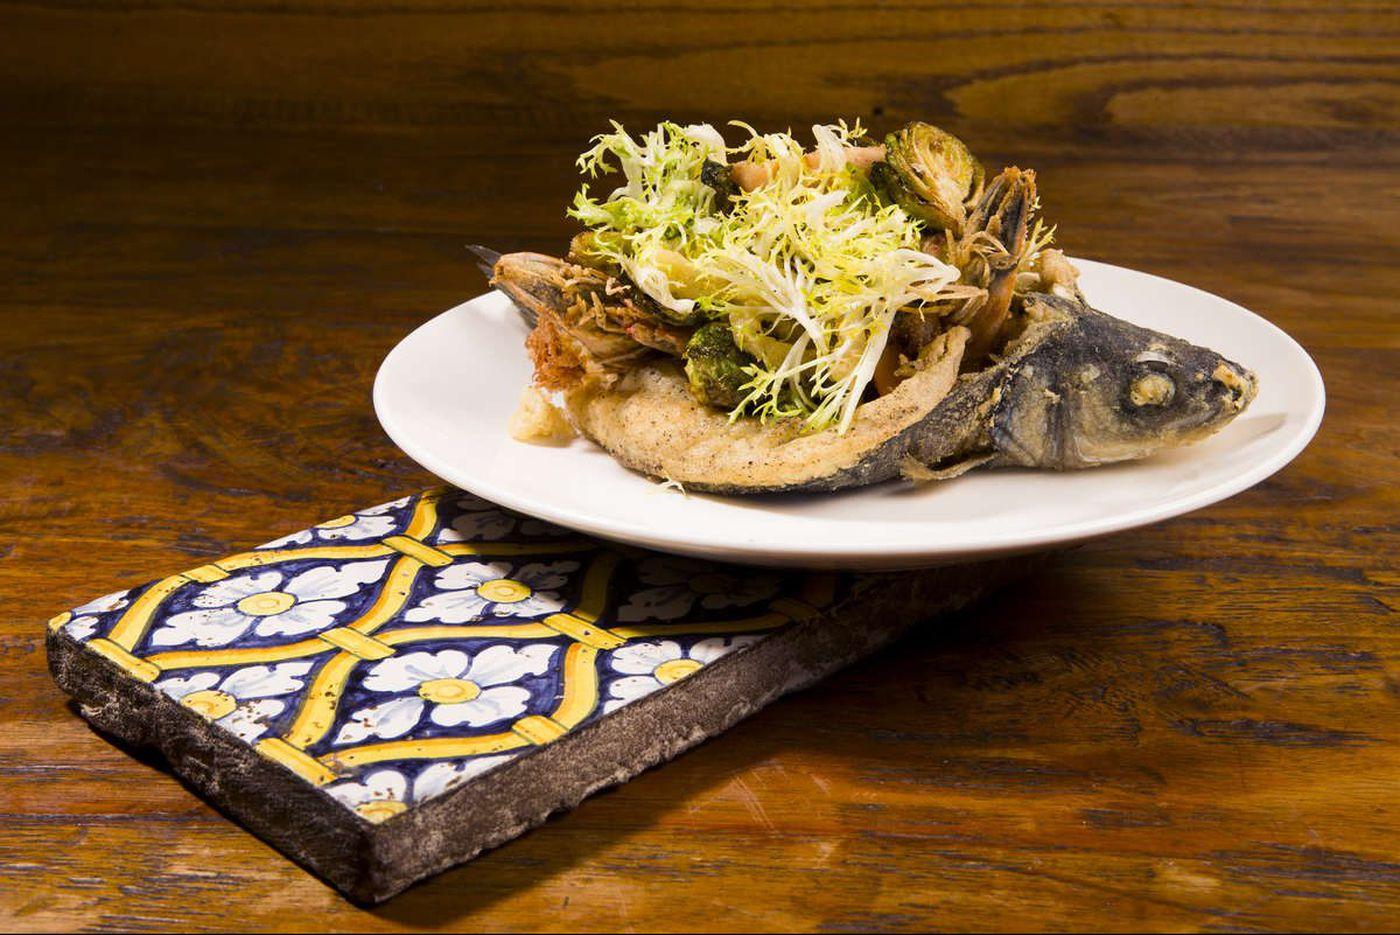 Italian favorites on East Passyunk Avenue reboot with new chefs